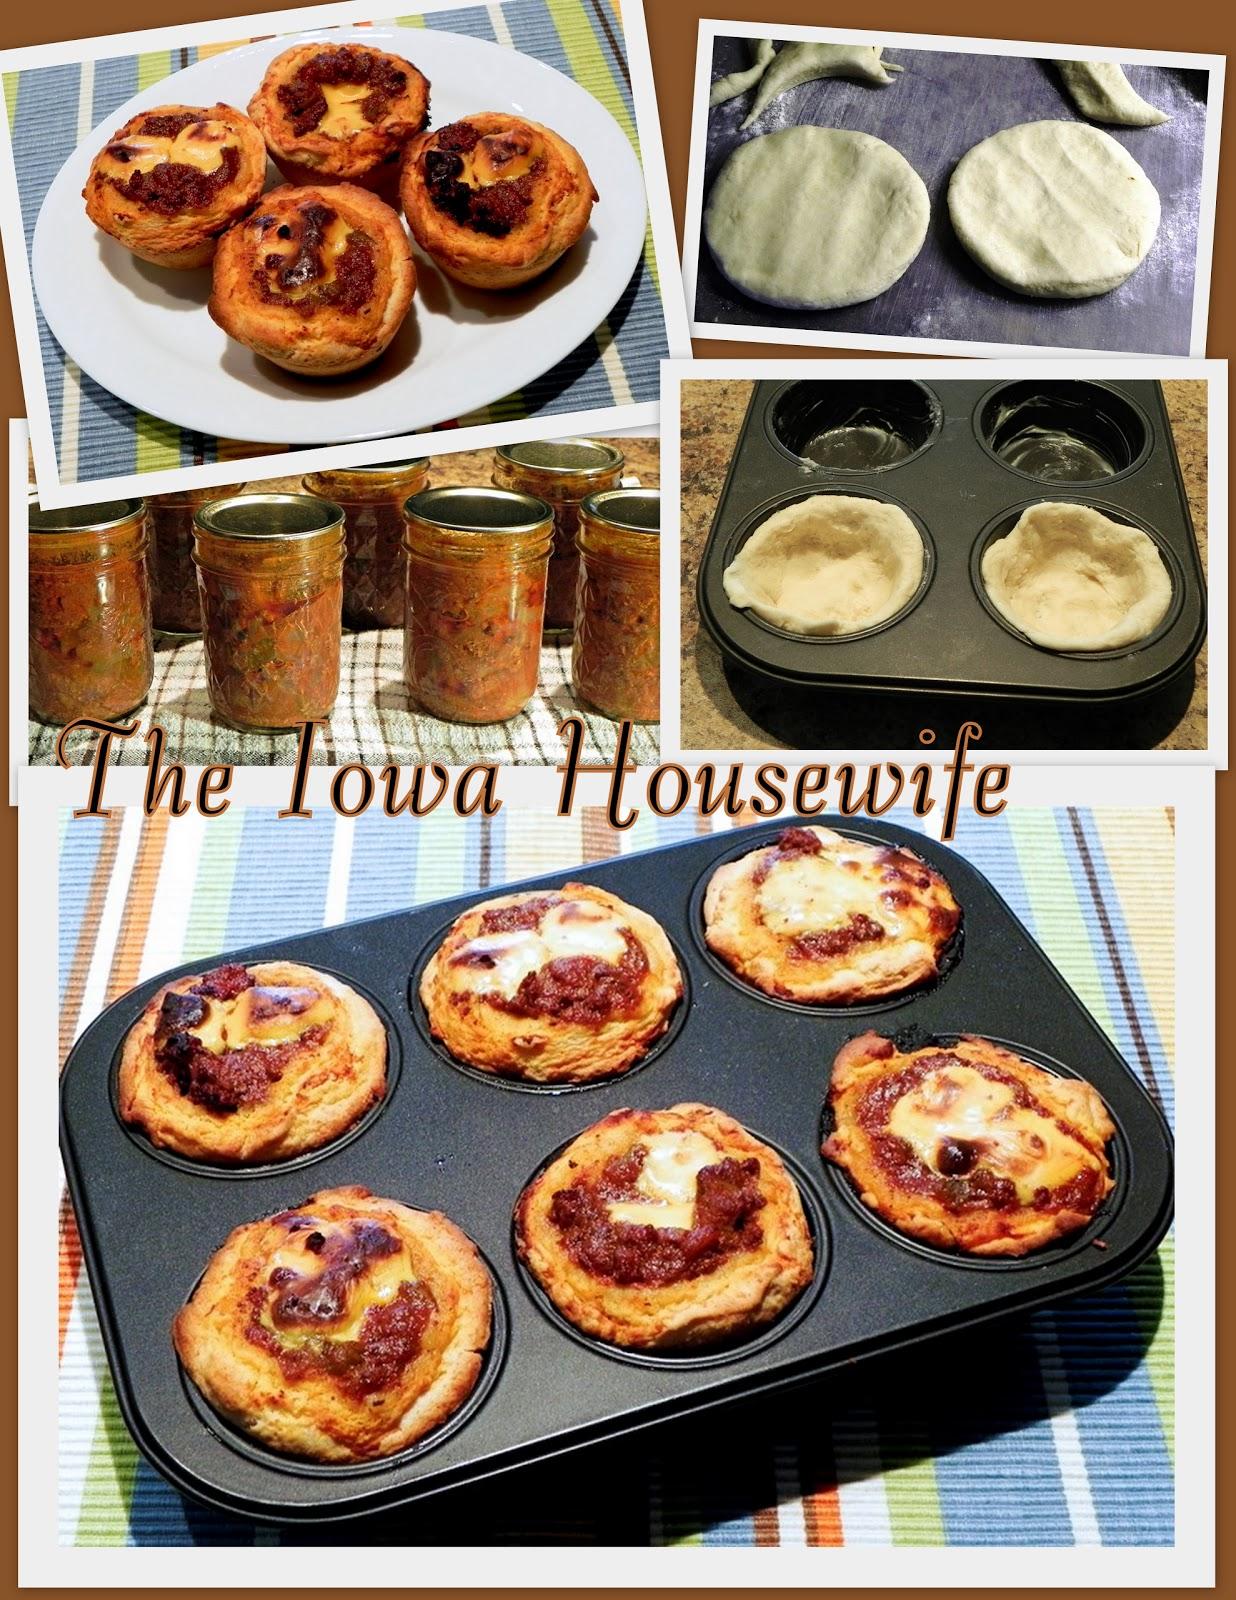 The Iowa Housewife: Hamburger Mix Cheeseburger Cup Muffins